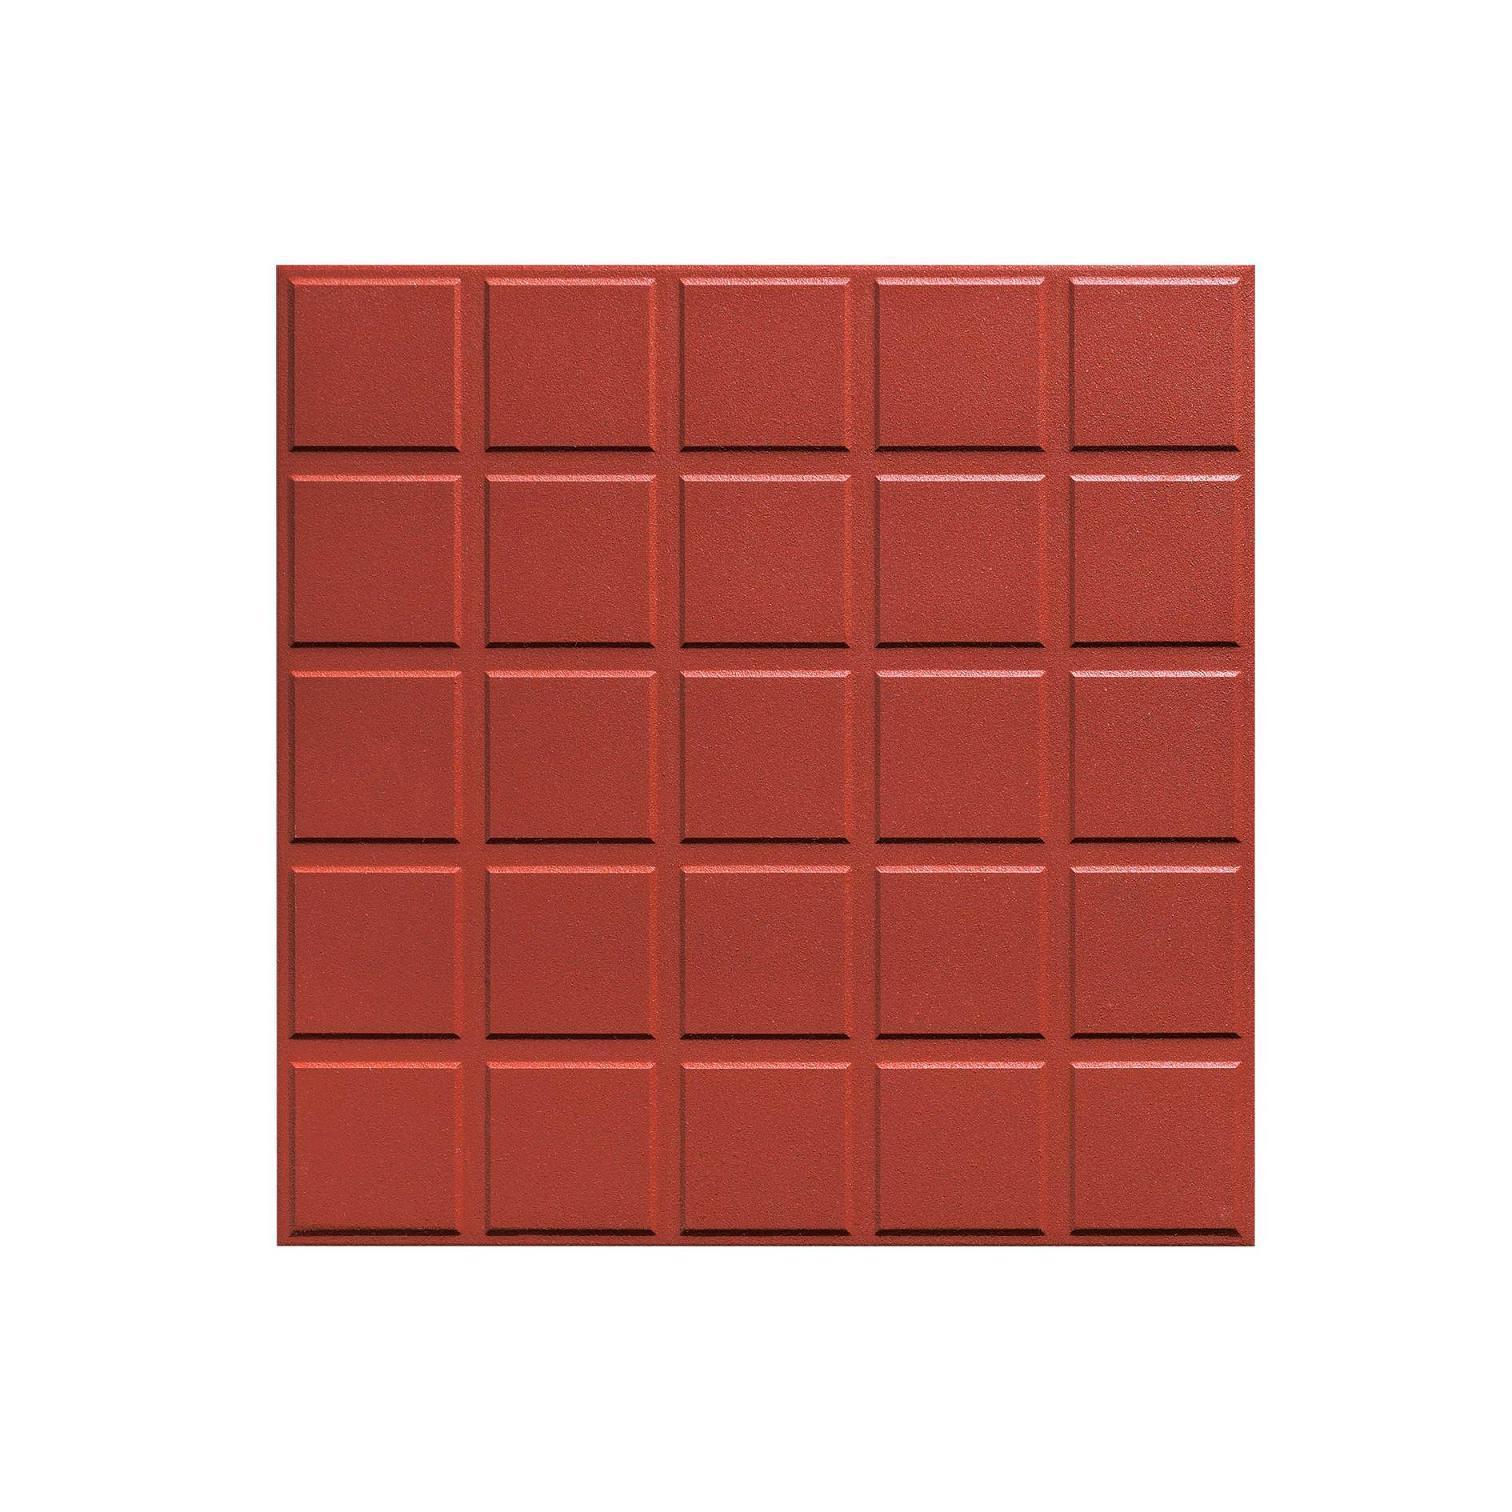 China Cheap Red Colour Clay Floor Tiles, Outdoor Terracotta Tiles ...